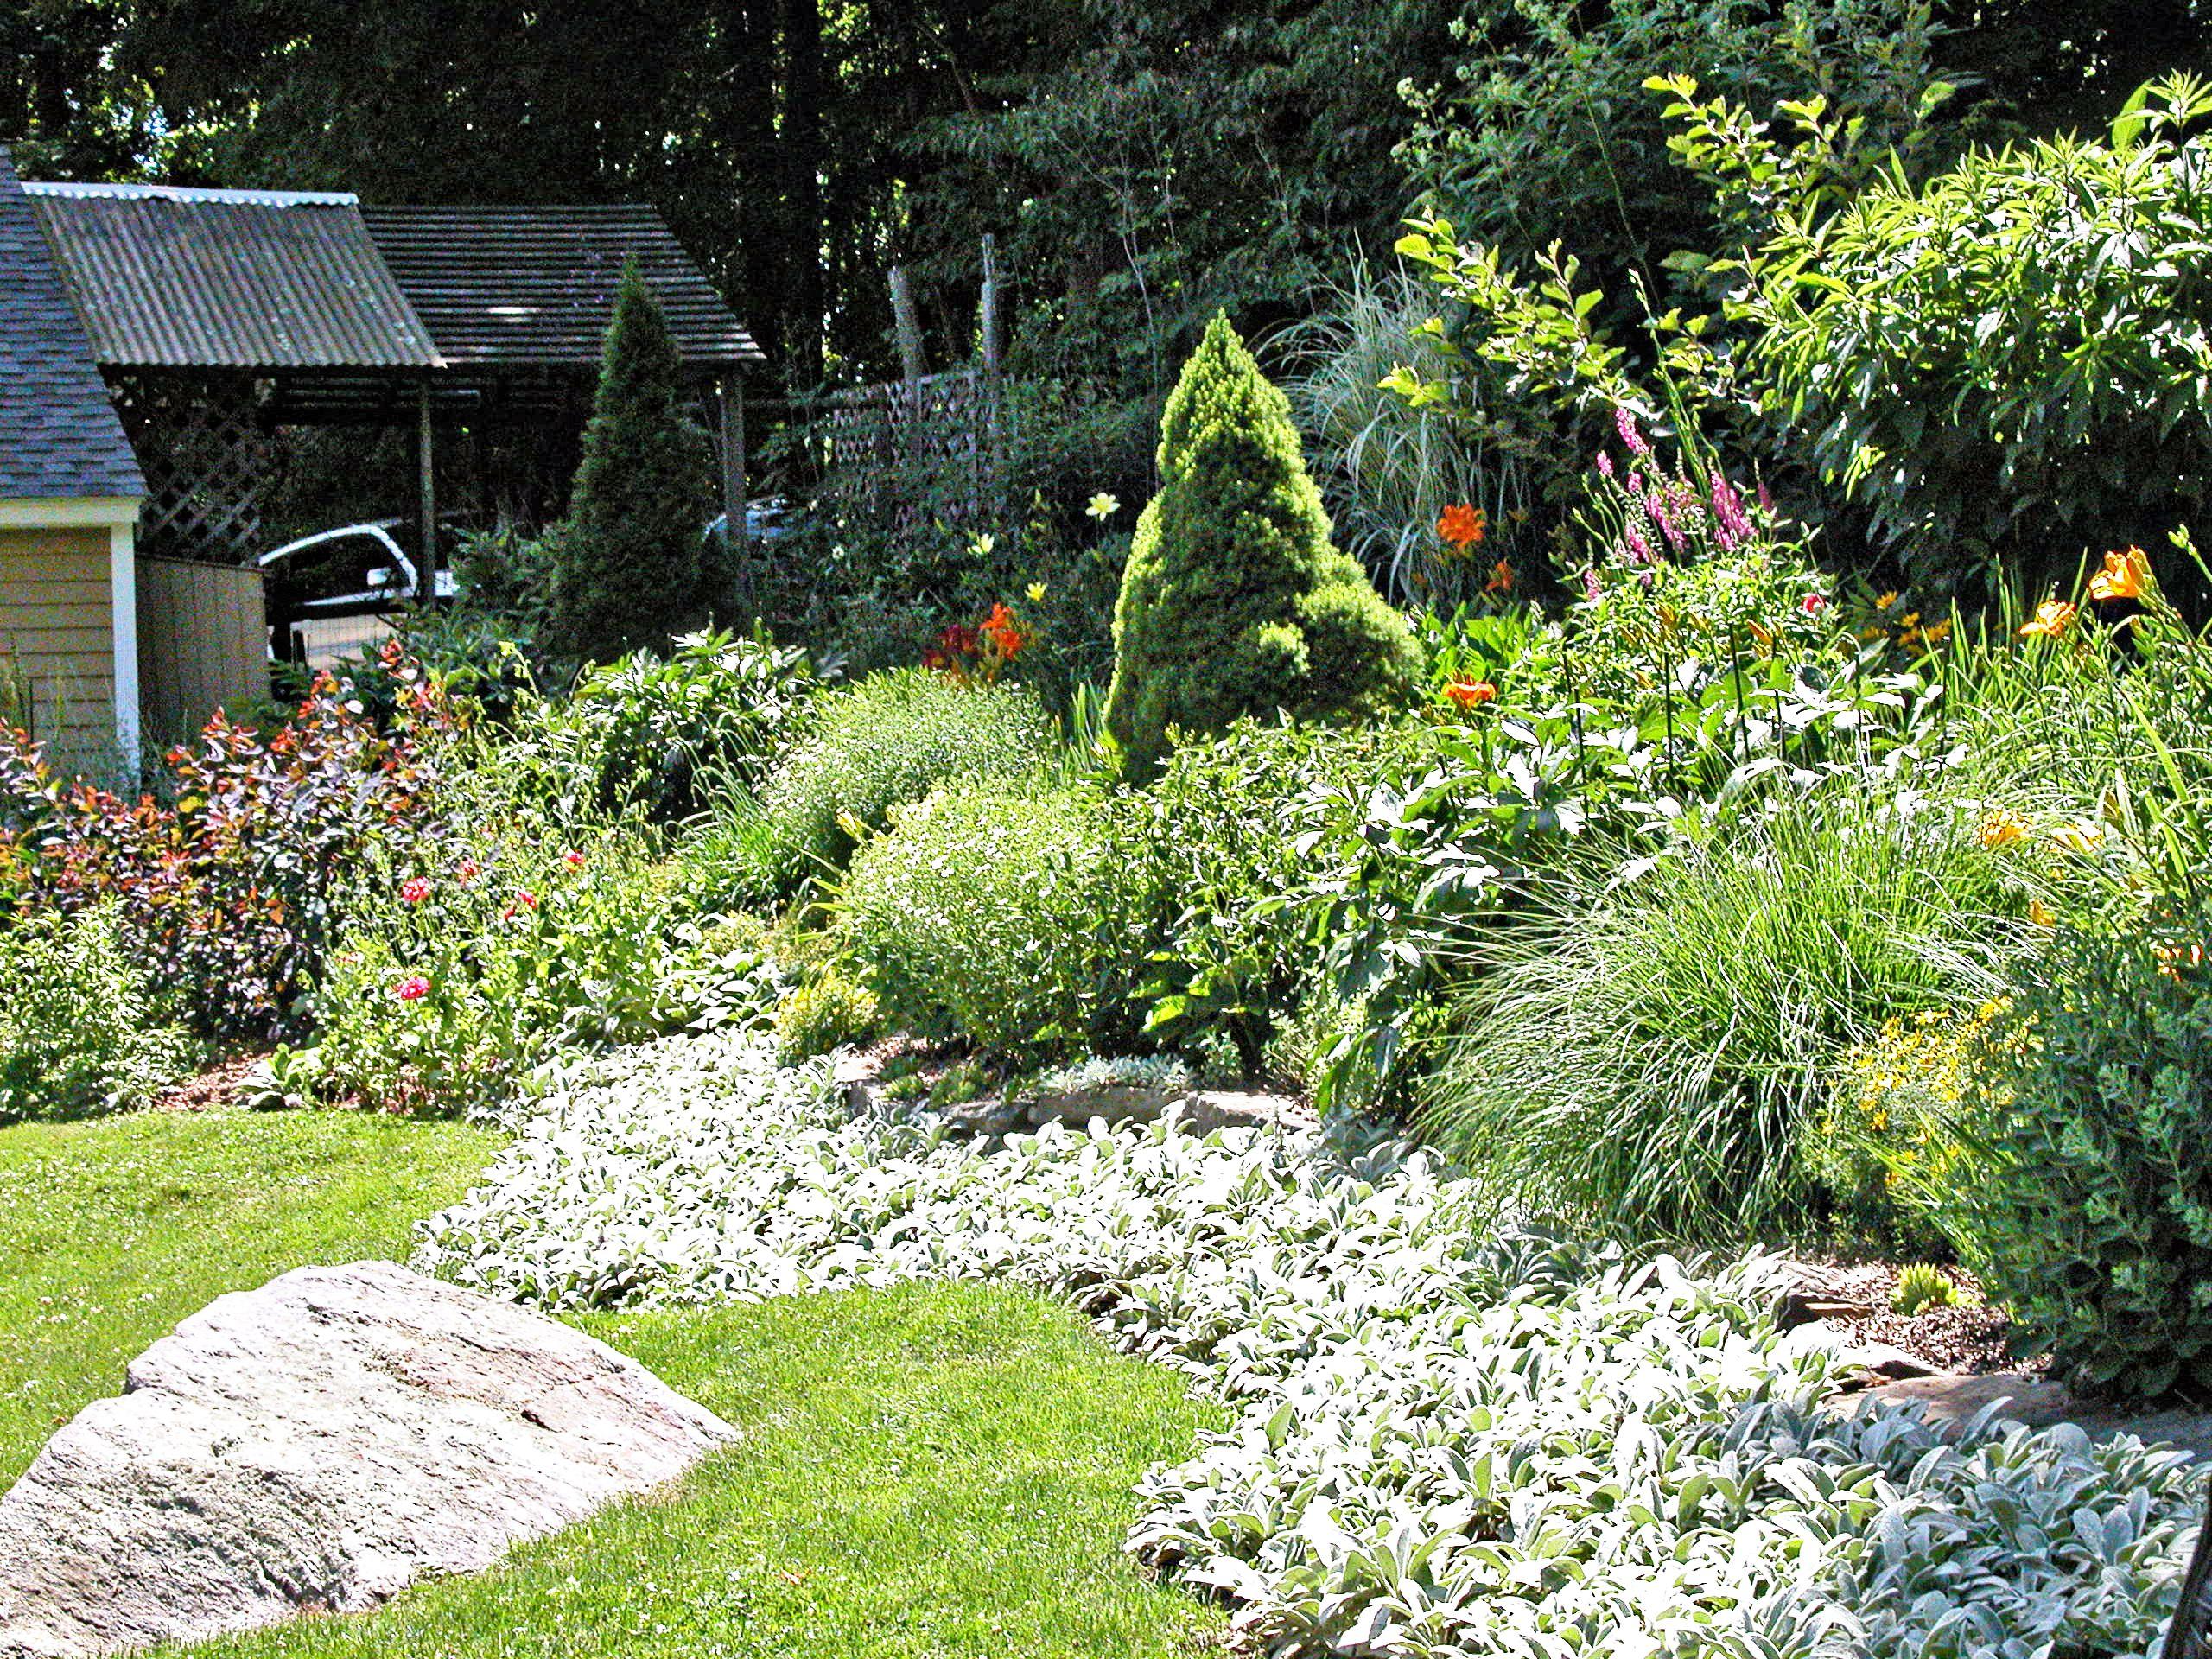 A beautiful garden in a large backyard